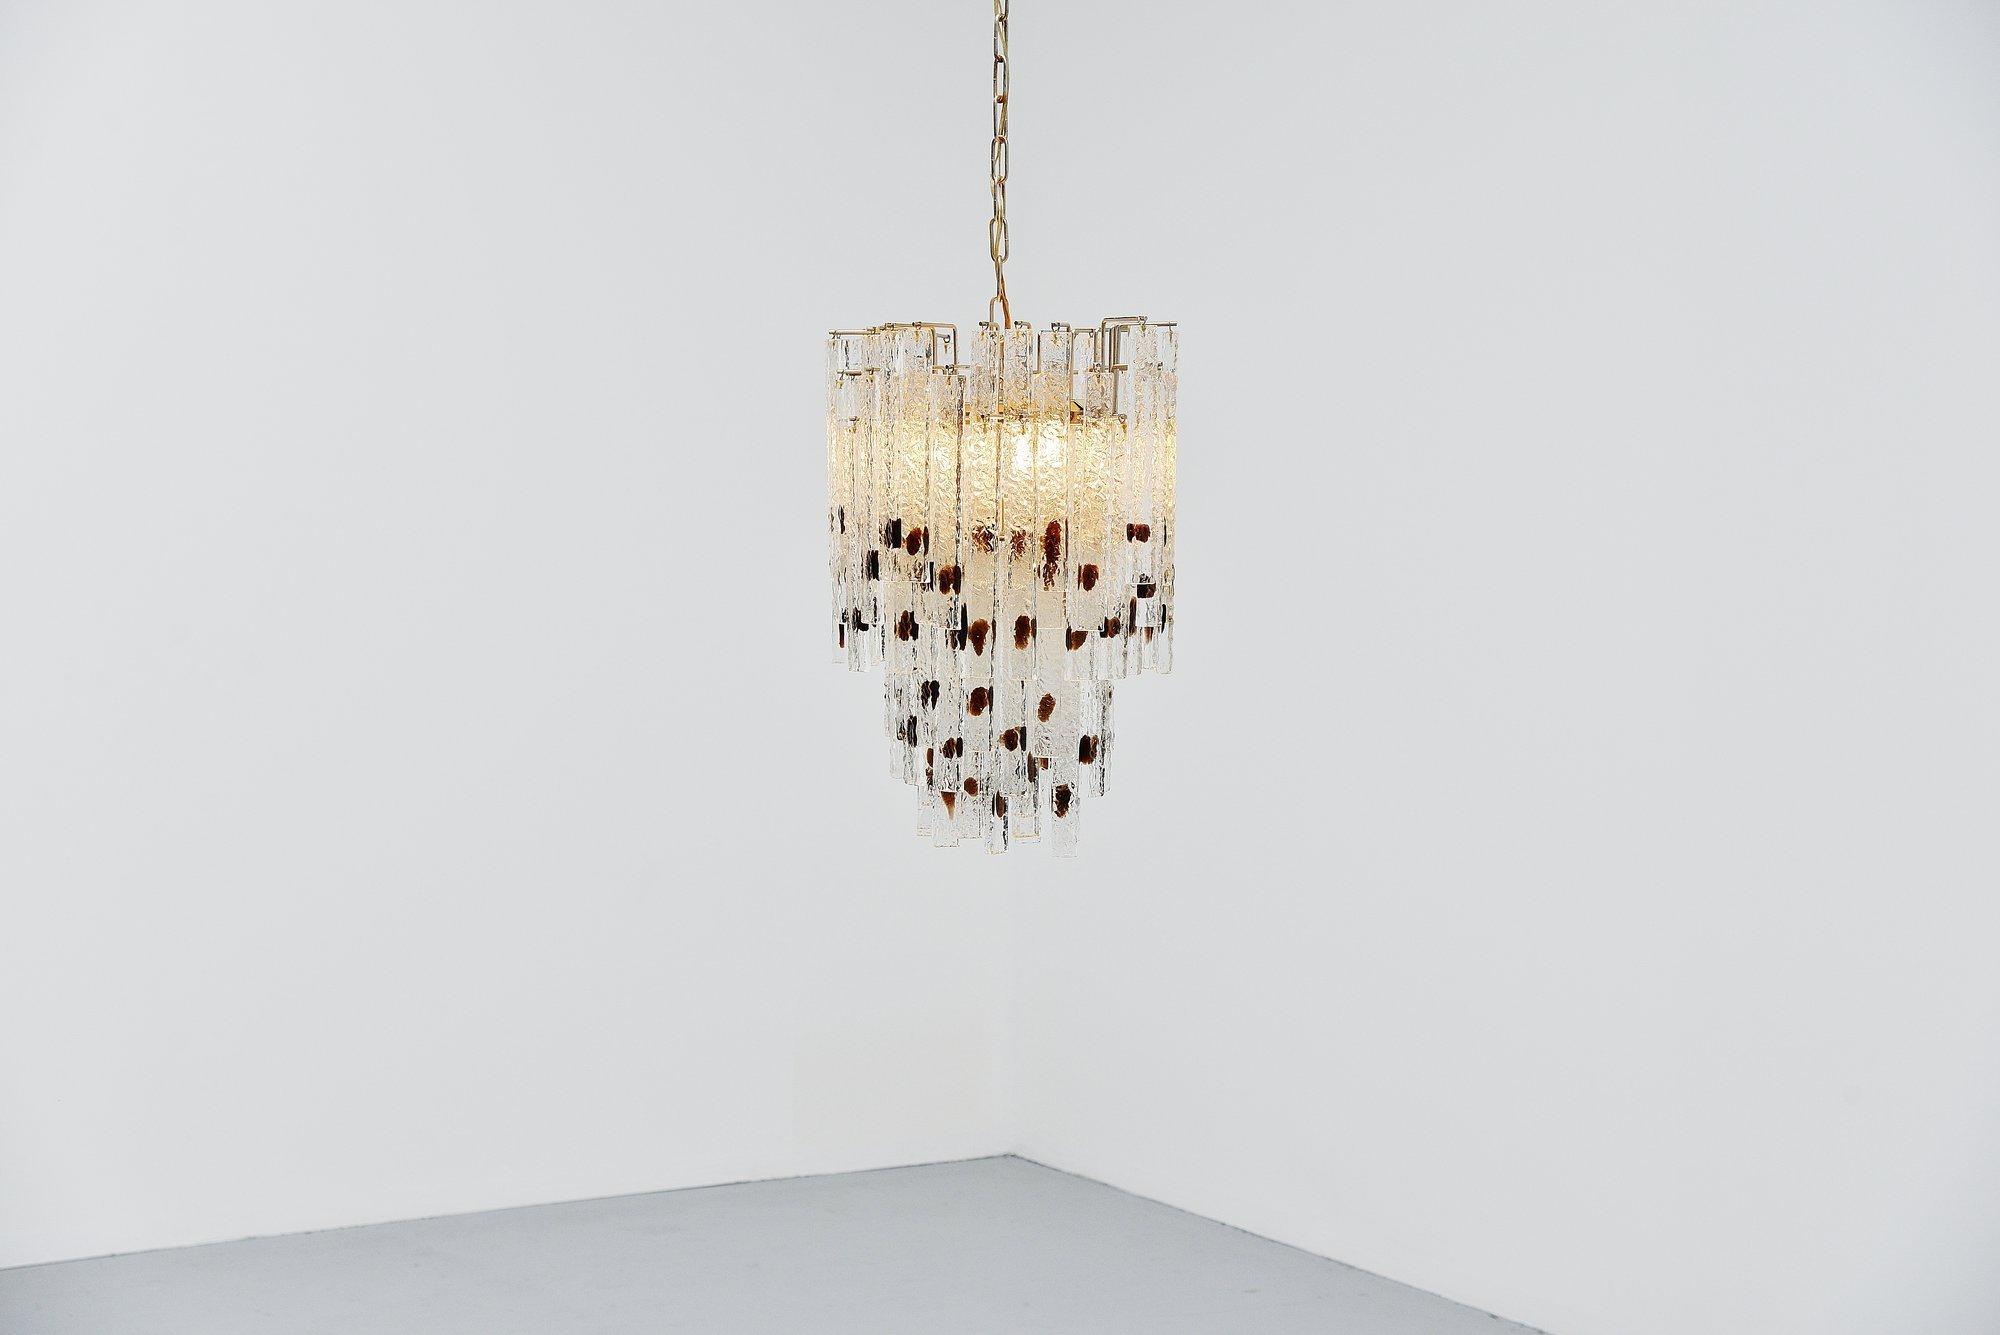 Venini chandelier murano italy 1960 massmoderndesign venini chandelier murano italy 1960 up down arubaitofo Gallery